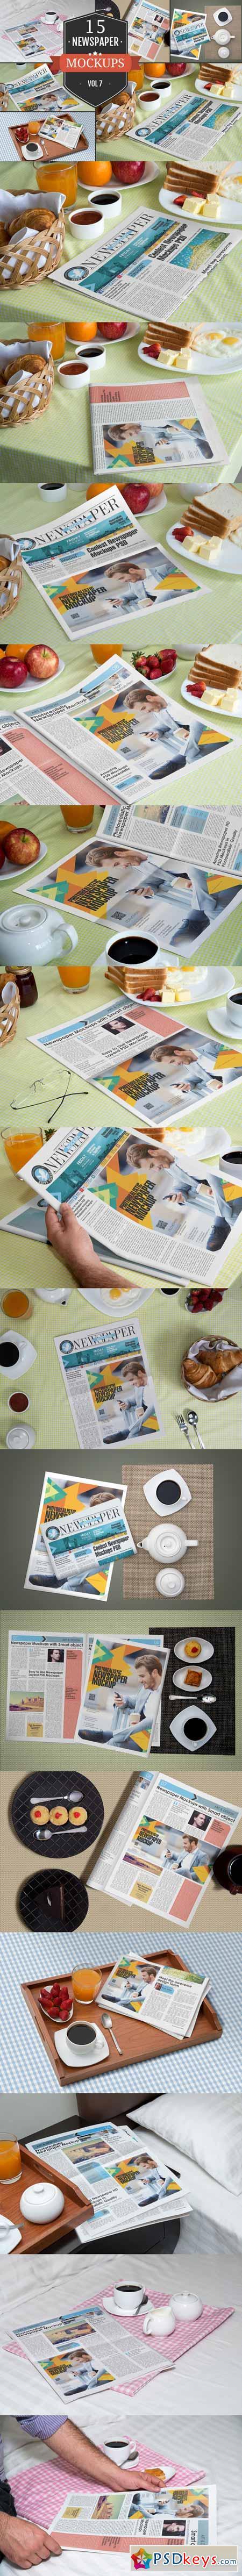 Newspaper Advertising Mockups Vol. 7 369568